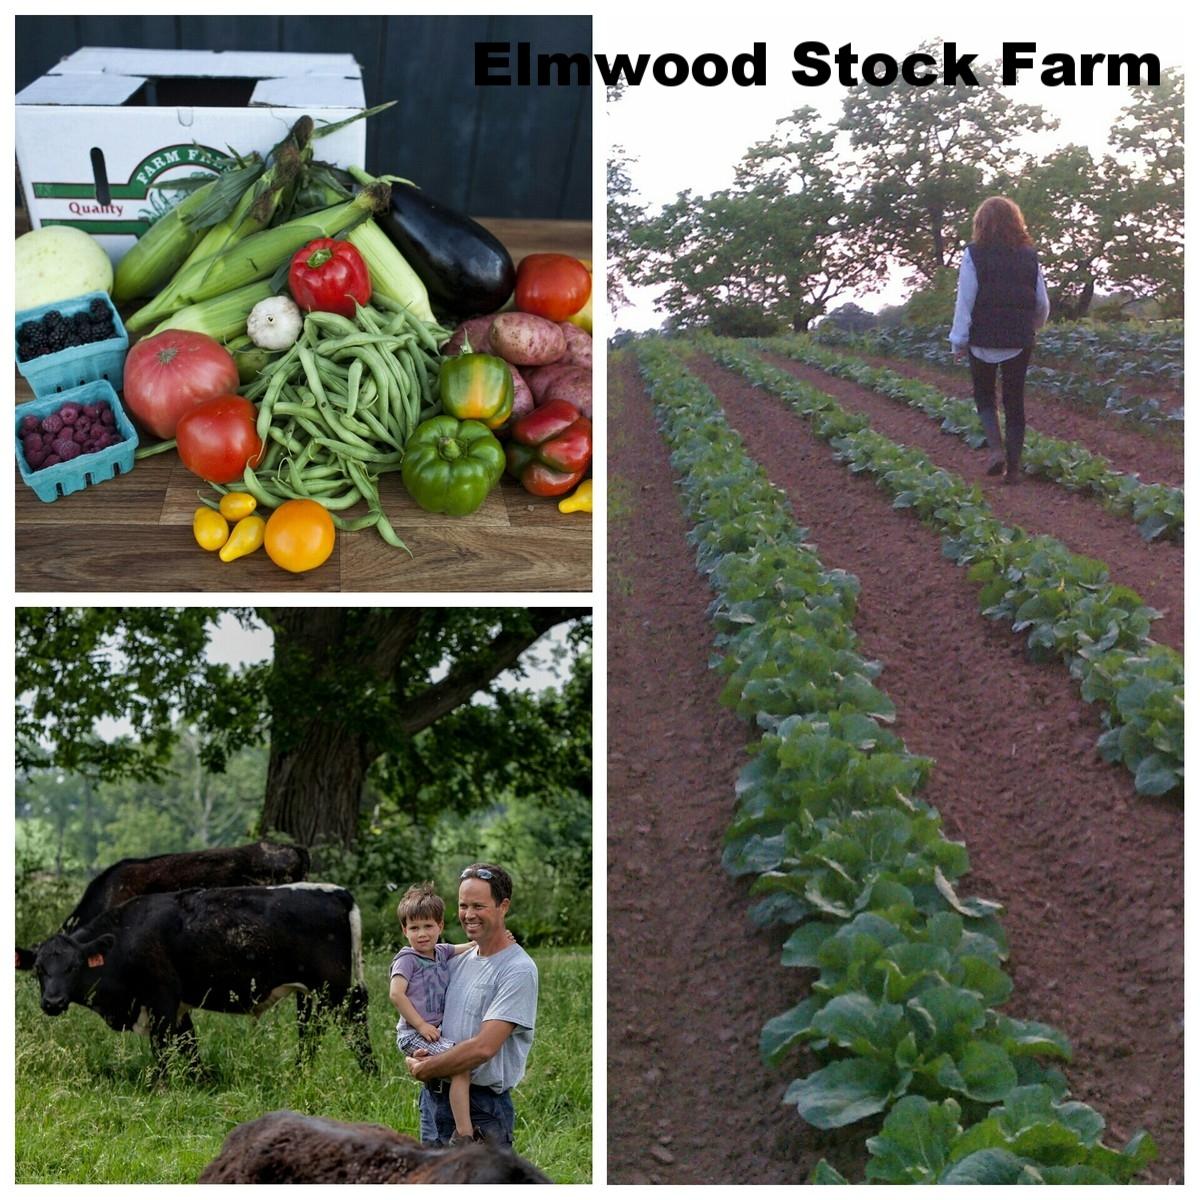 Elmwood_PhotoGrid.jpg